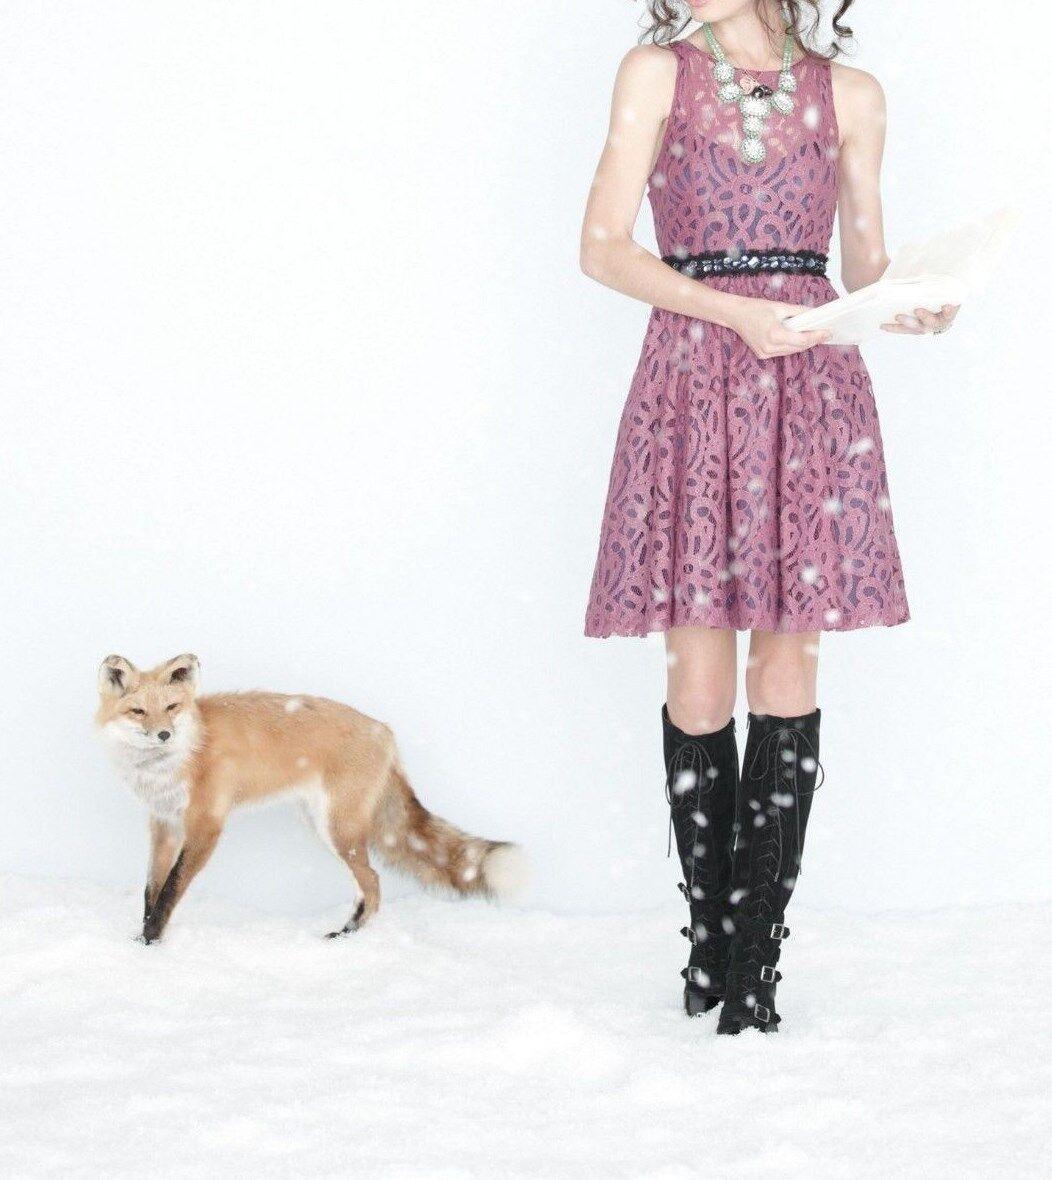 Anthropologie Mariposa Lace Dress Plenty by Tracy Reese Plum Größes 10, 12P NEW